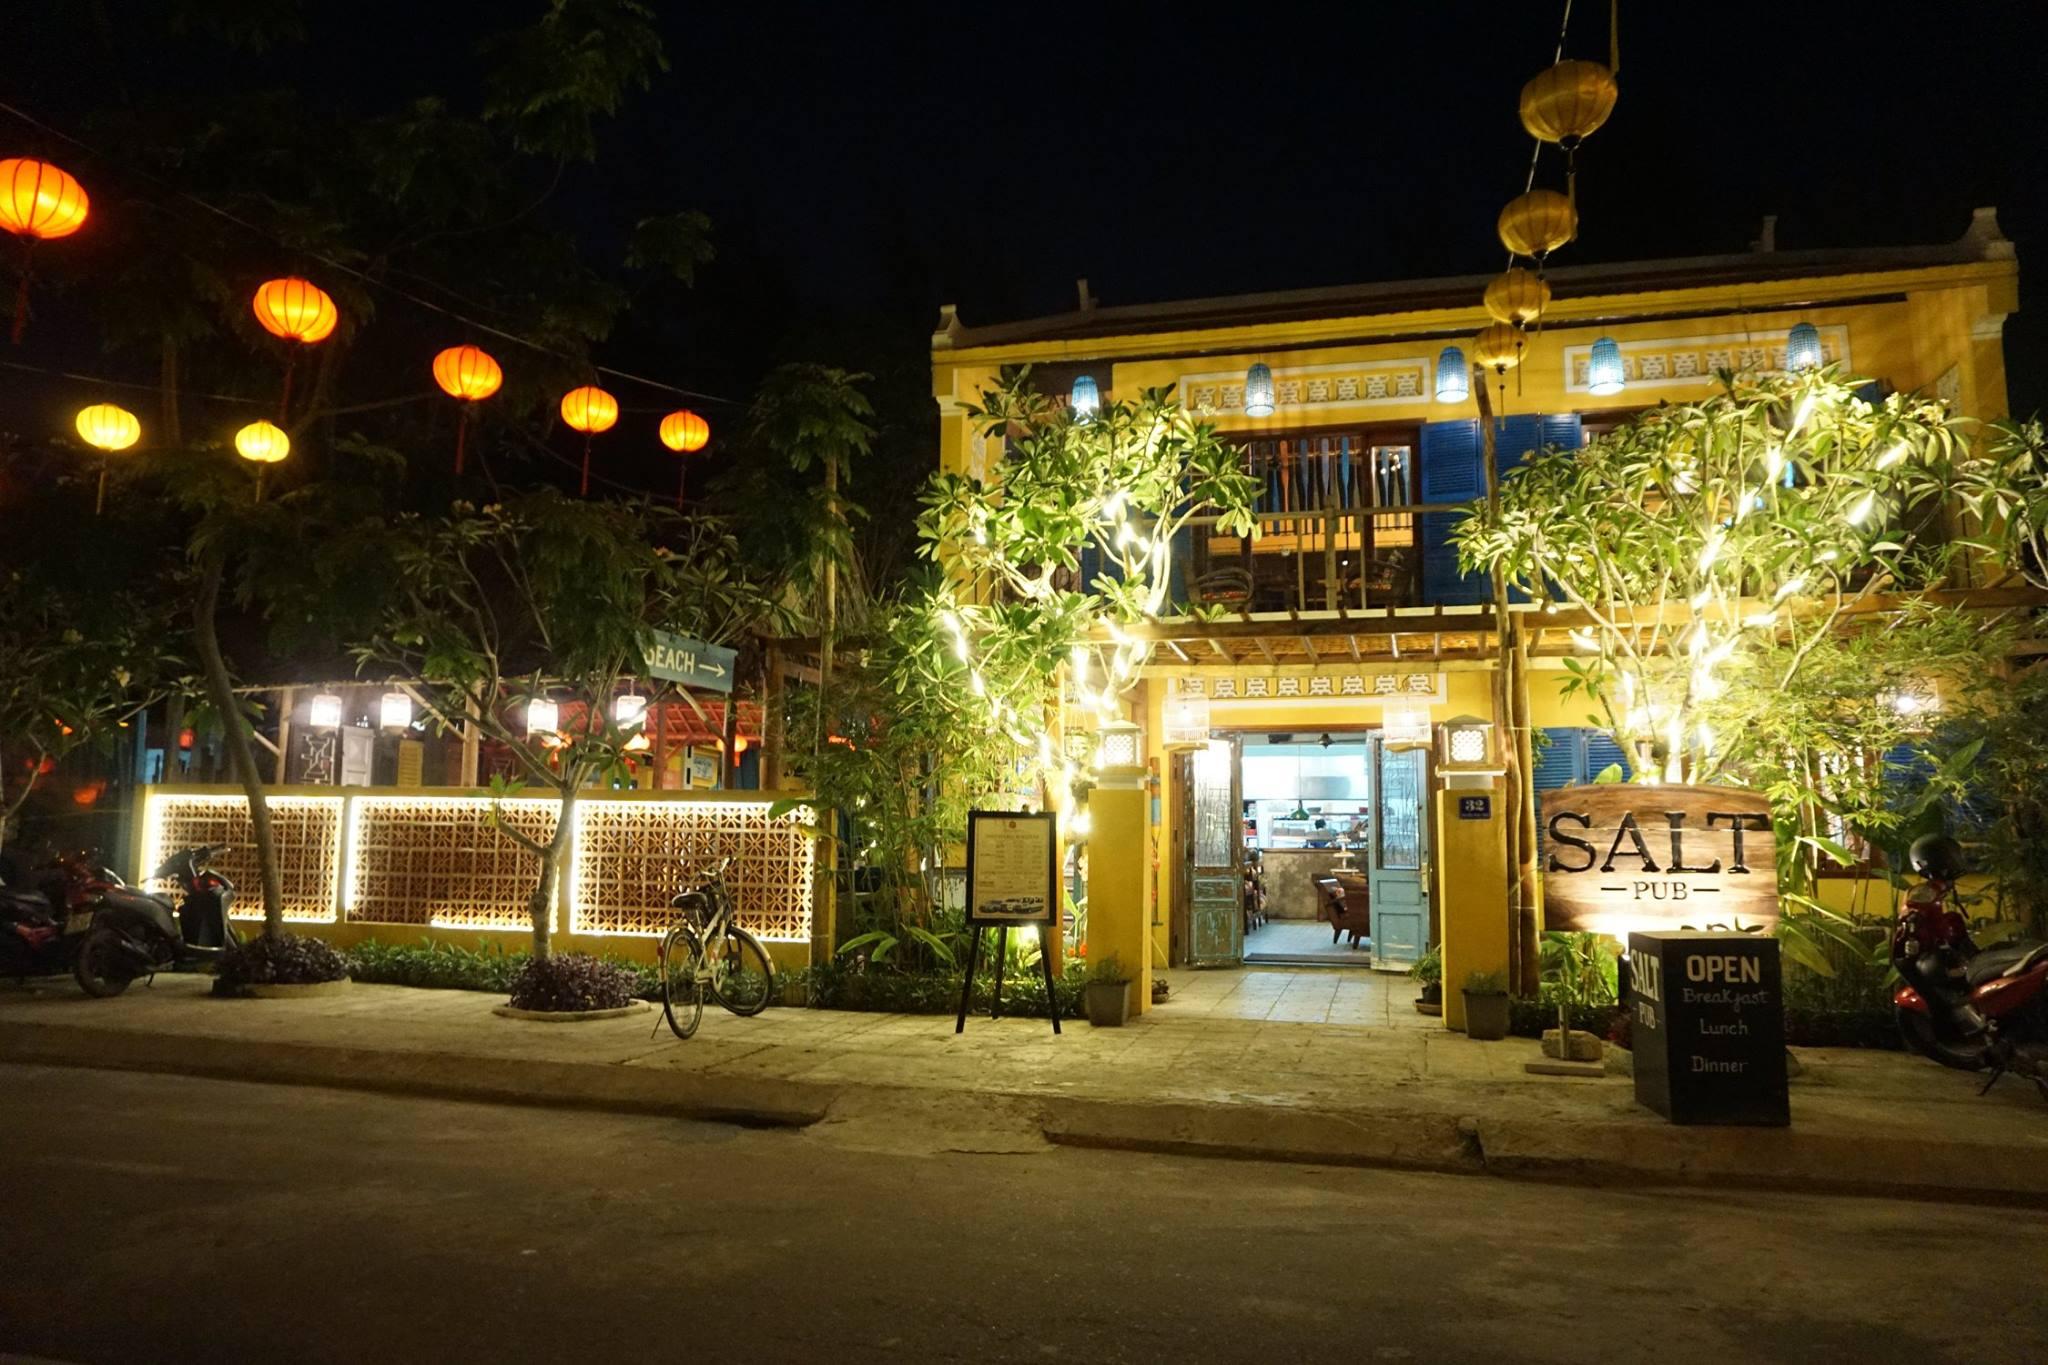 The Salt Pub restaurant at night